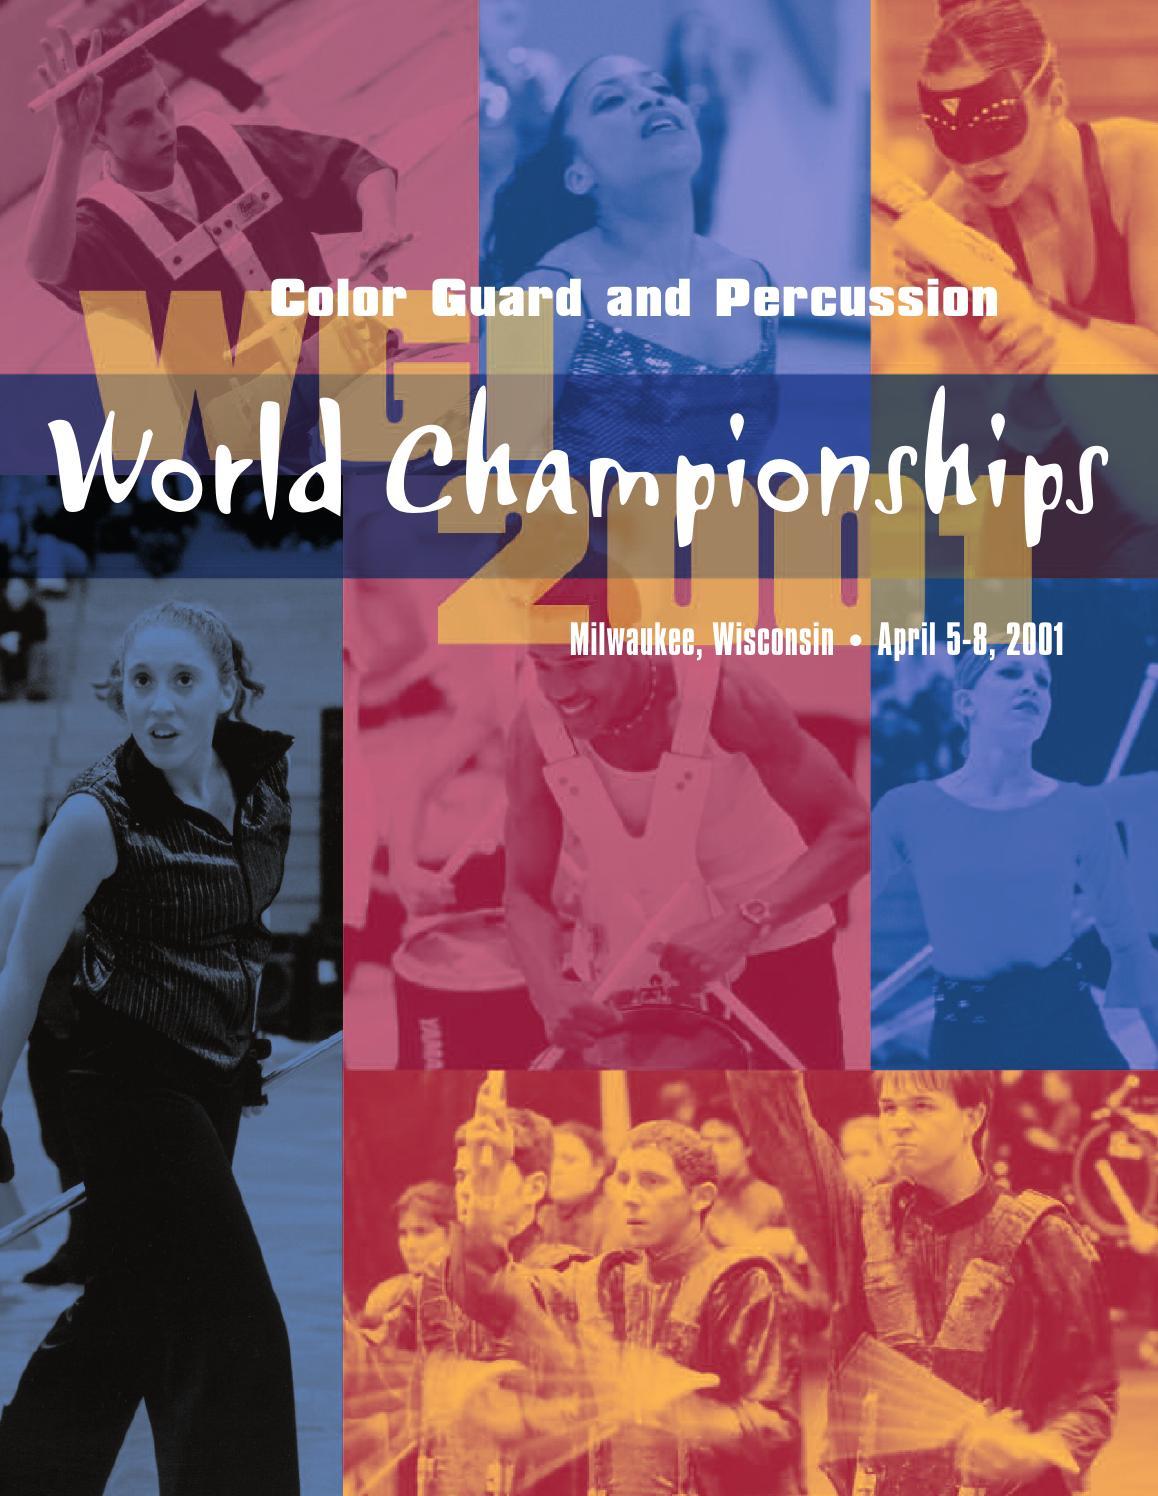 Articles about color guard - 2006 Wgi Color Guard World Championships Program By Wgisportofthearts Issuu